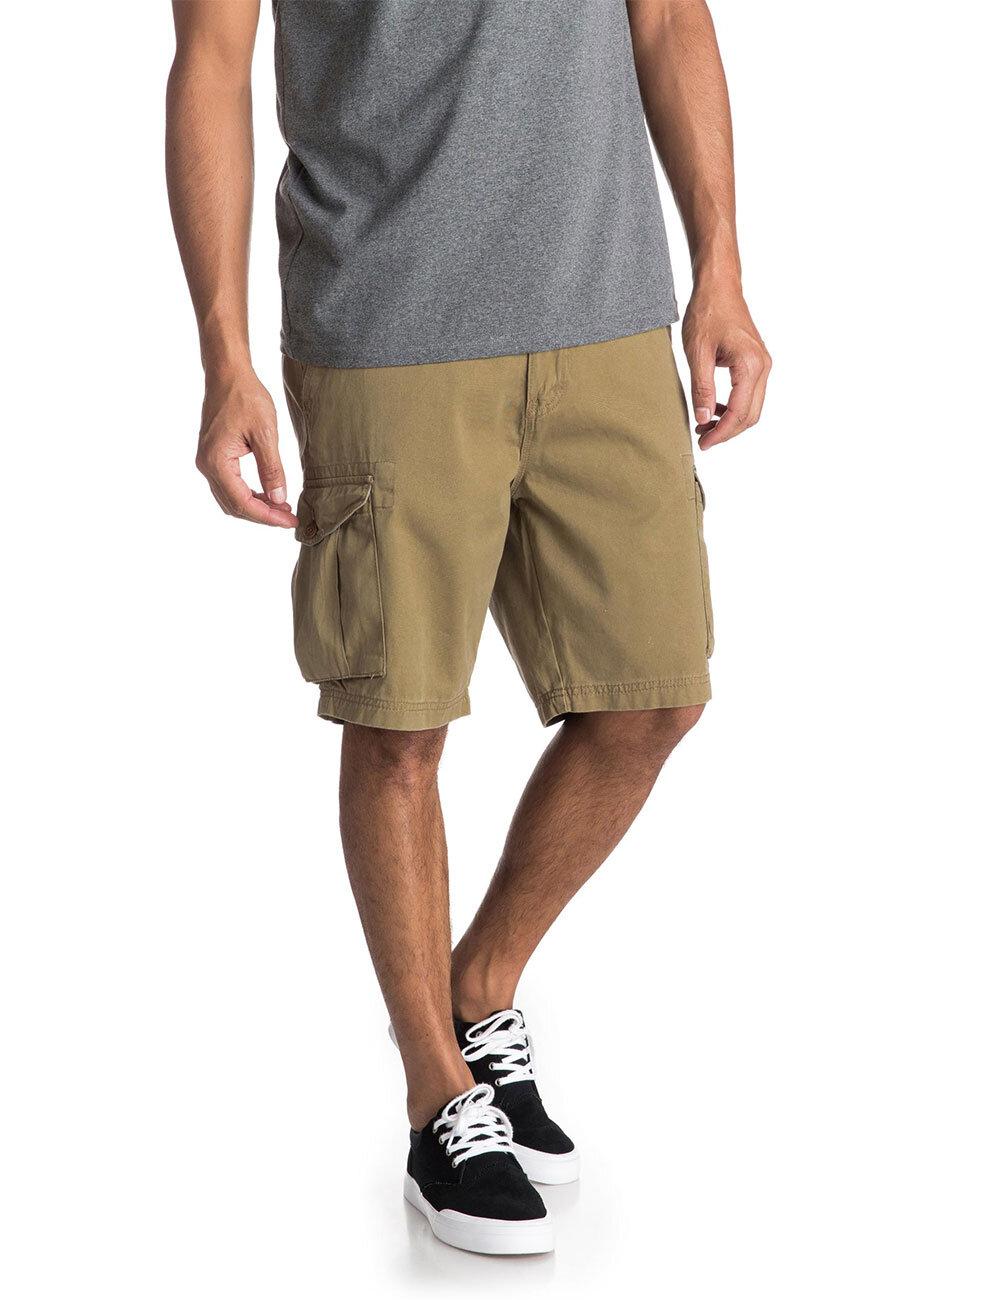 efb5c4c3cf CRUCIAL BATTLE SHORT - Men's Shorts & Pants | Surf & Skate Clothing |  Streetwear - QUIKSILVER S18